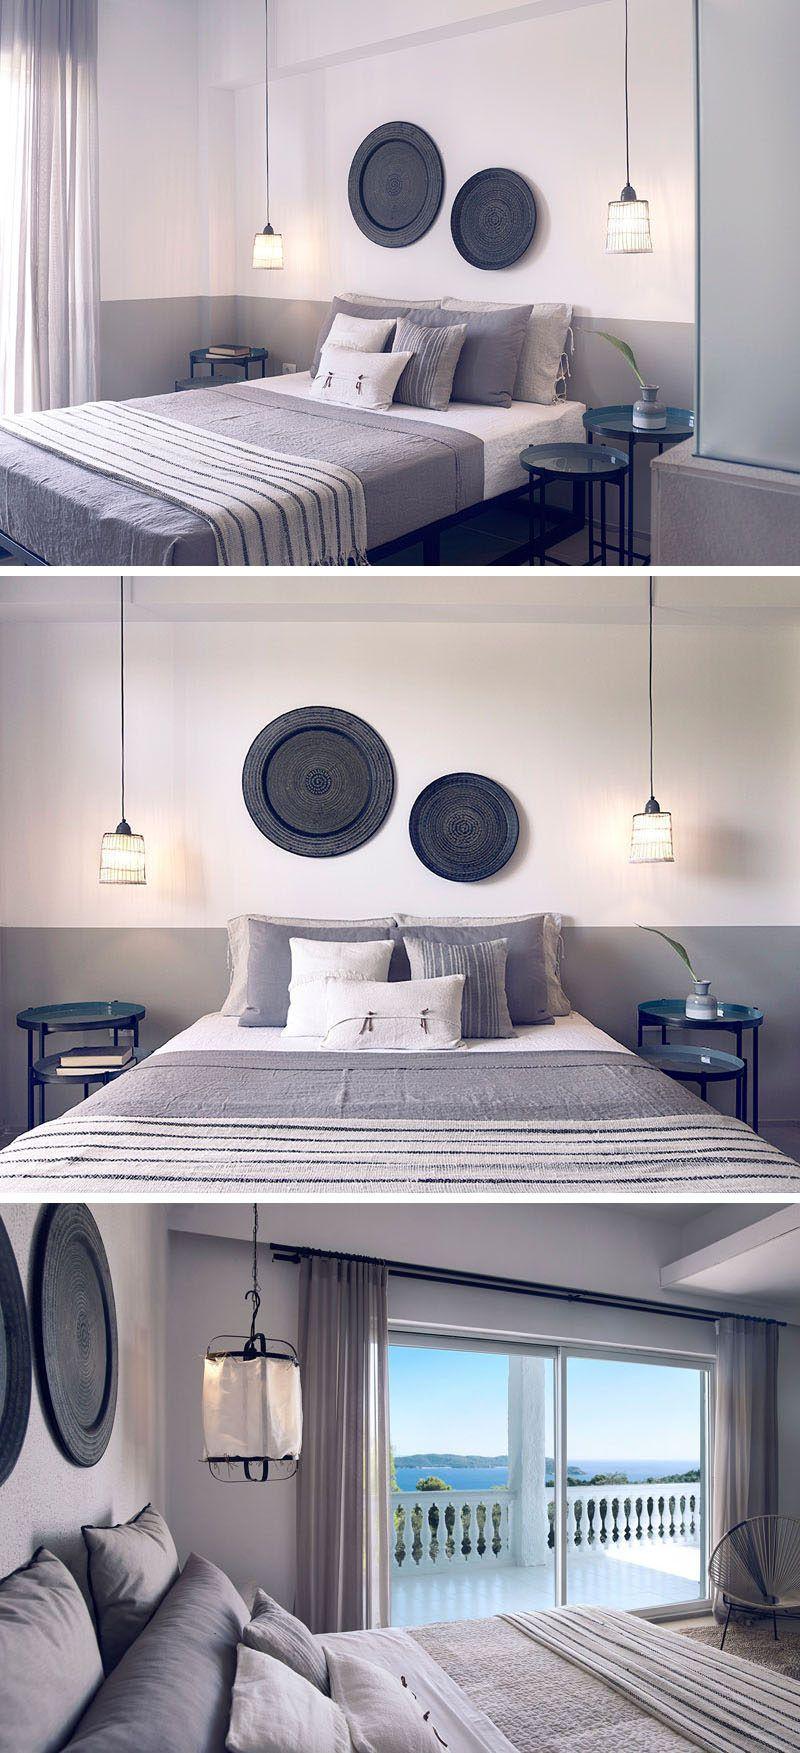 . Skiathos Blu is a Greek hotel that puts a contemporary twist on